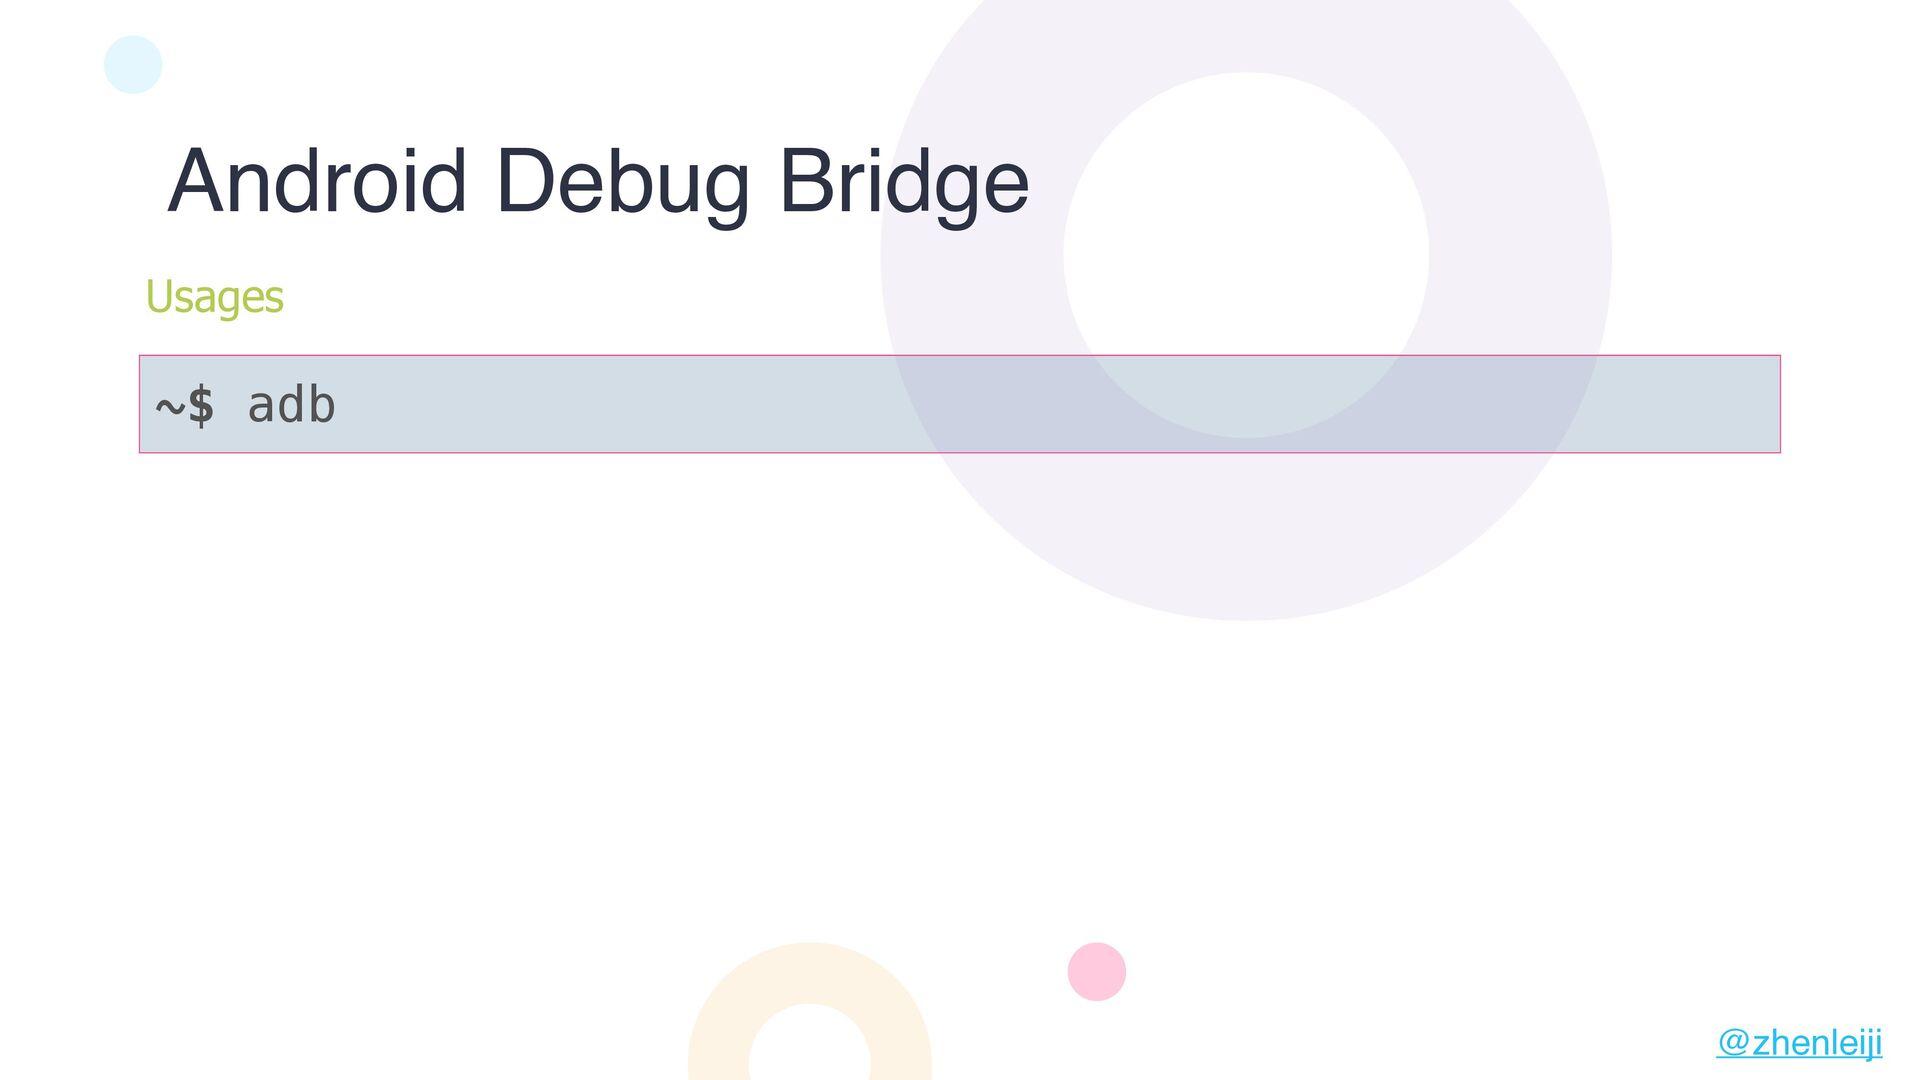 ~$ adb Android Debug Bridge Usages